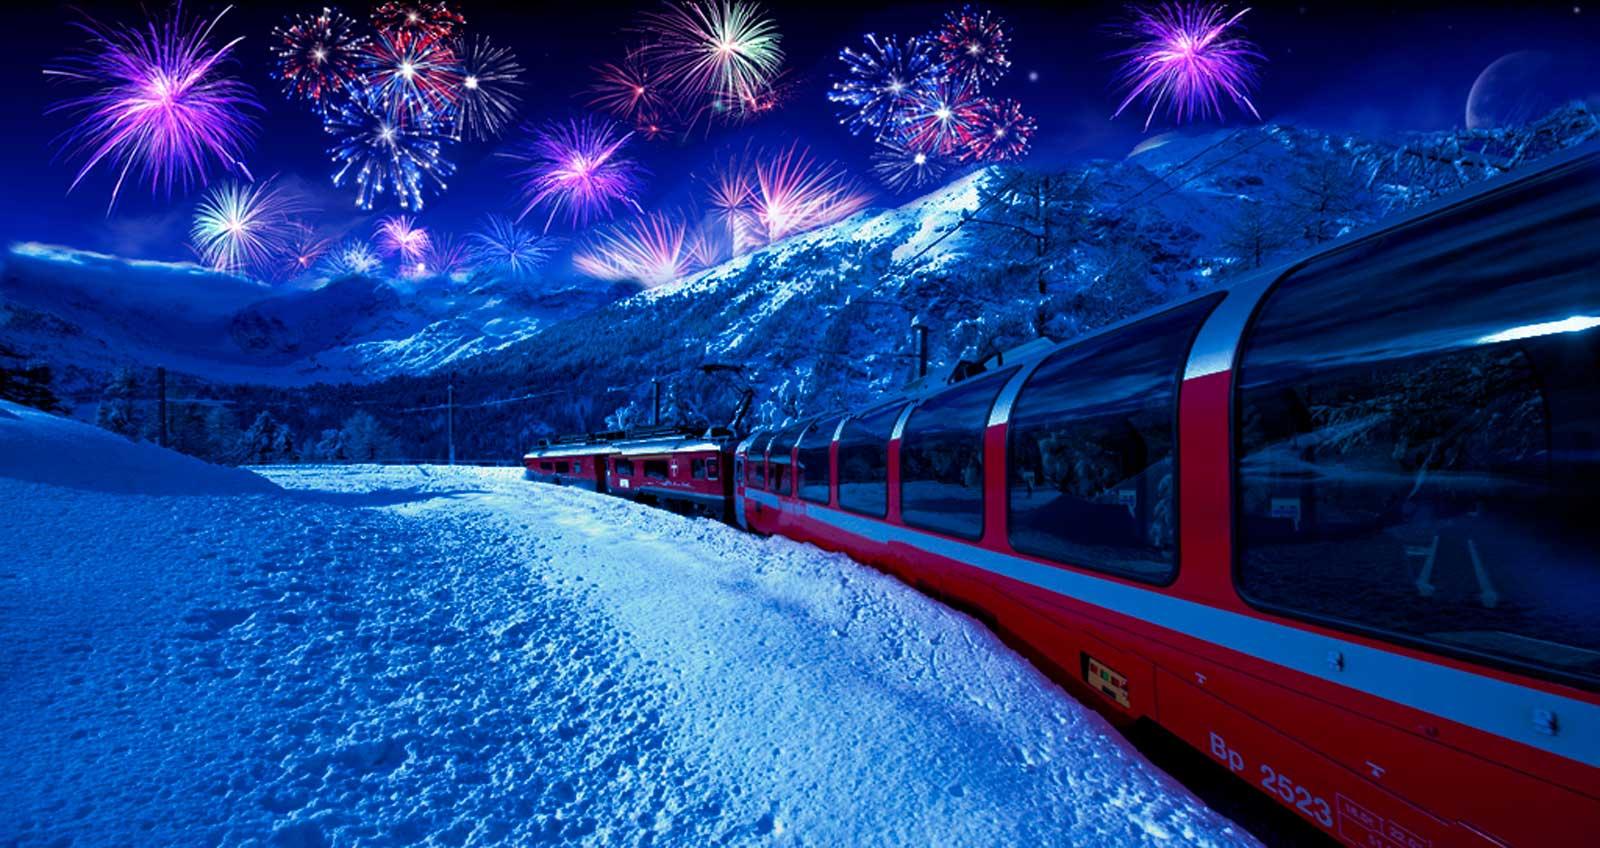 Capodanno Trenino del Bernina  Trenino del Bernina